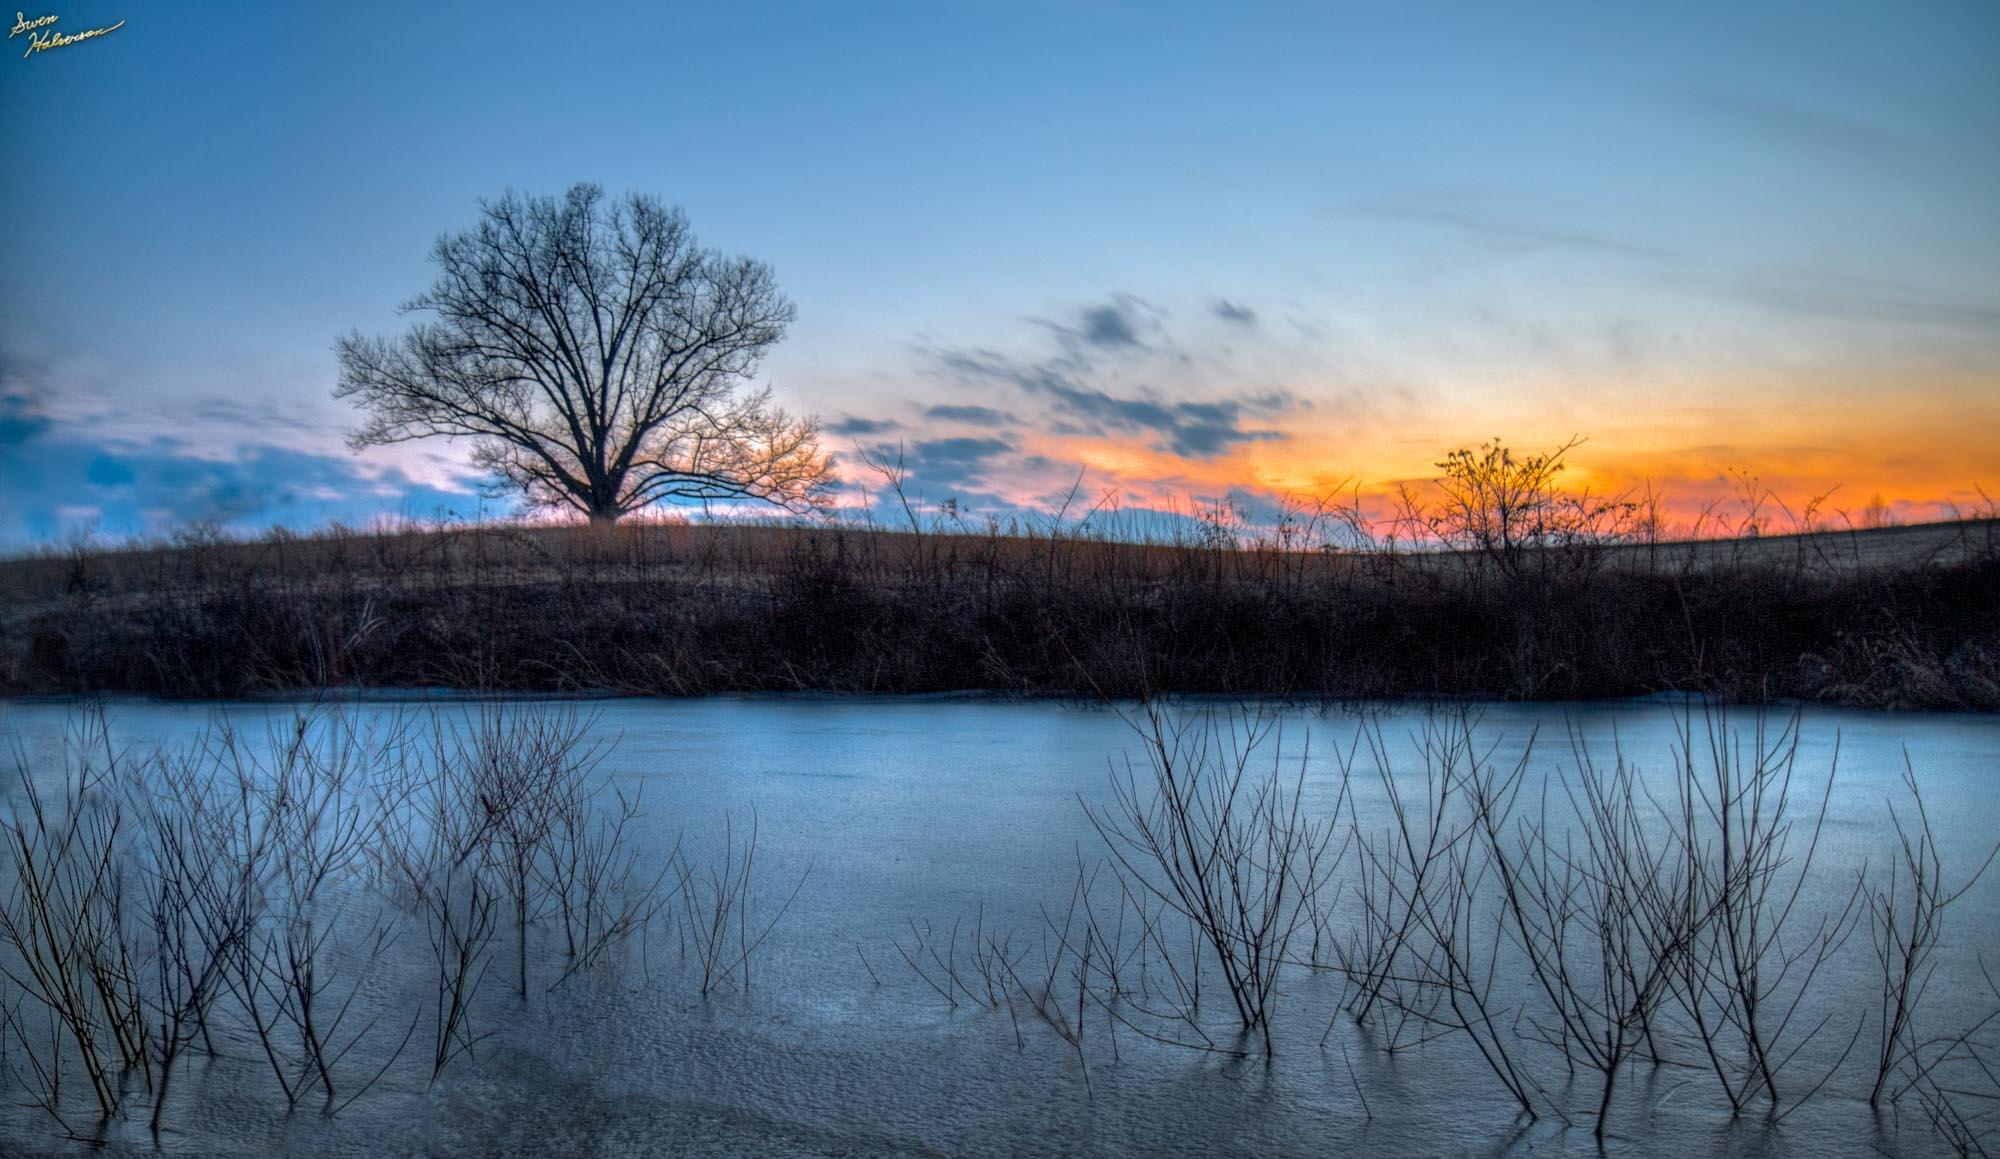 Theme: Clouds | Title: Wispy Ice Sunset